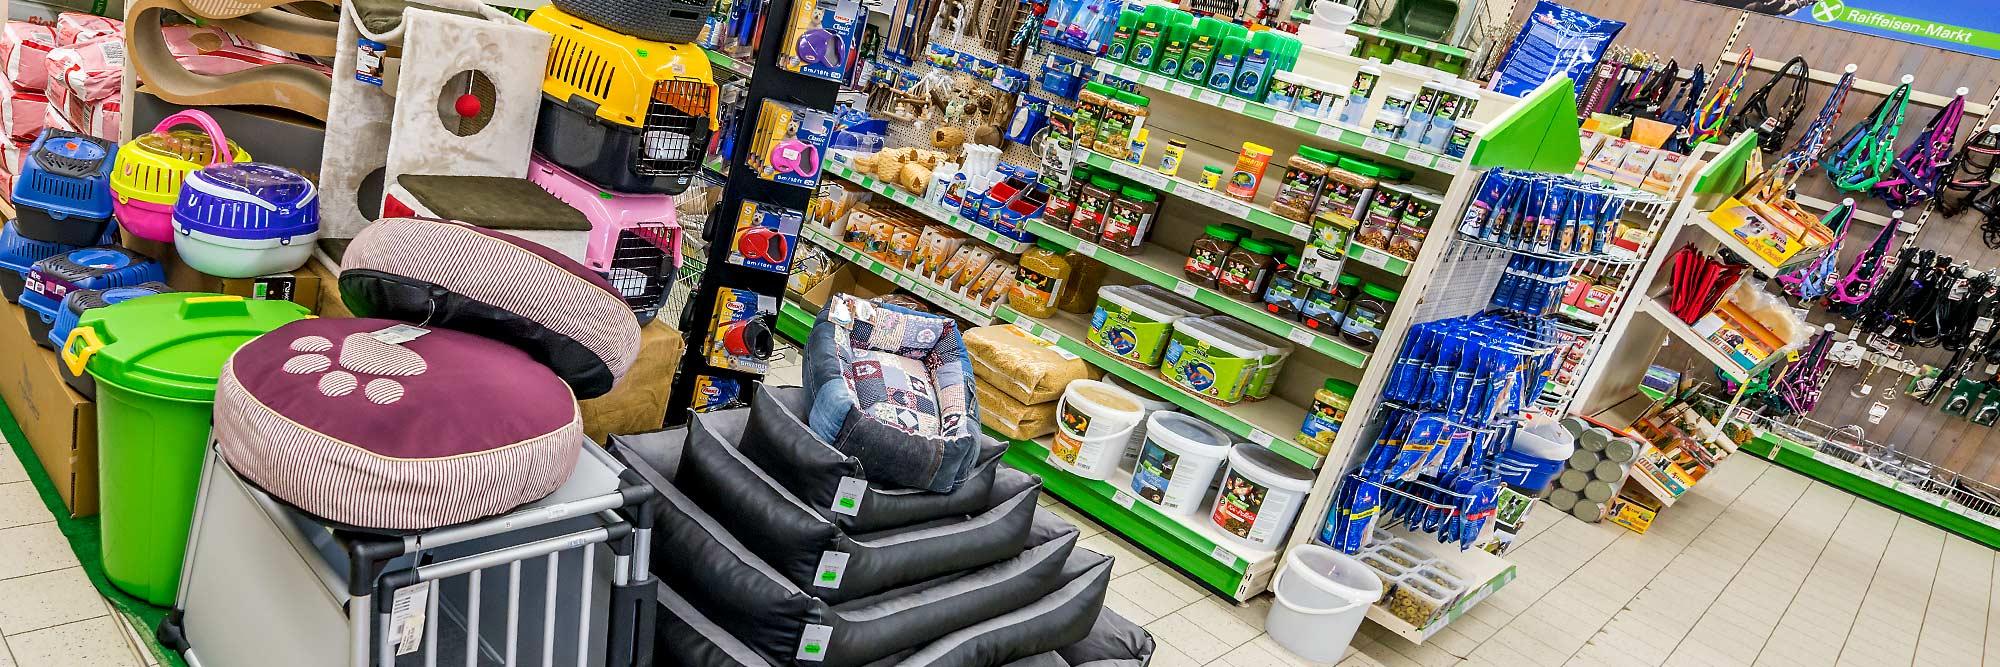 Raiffeisen Markt Ottmarsbocholt Tierboxen